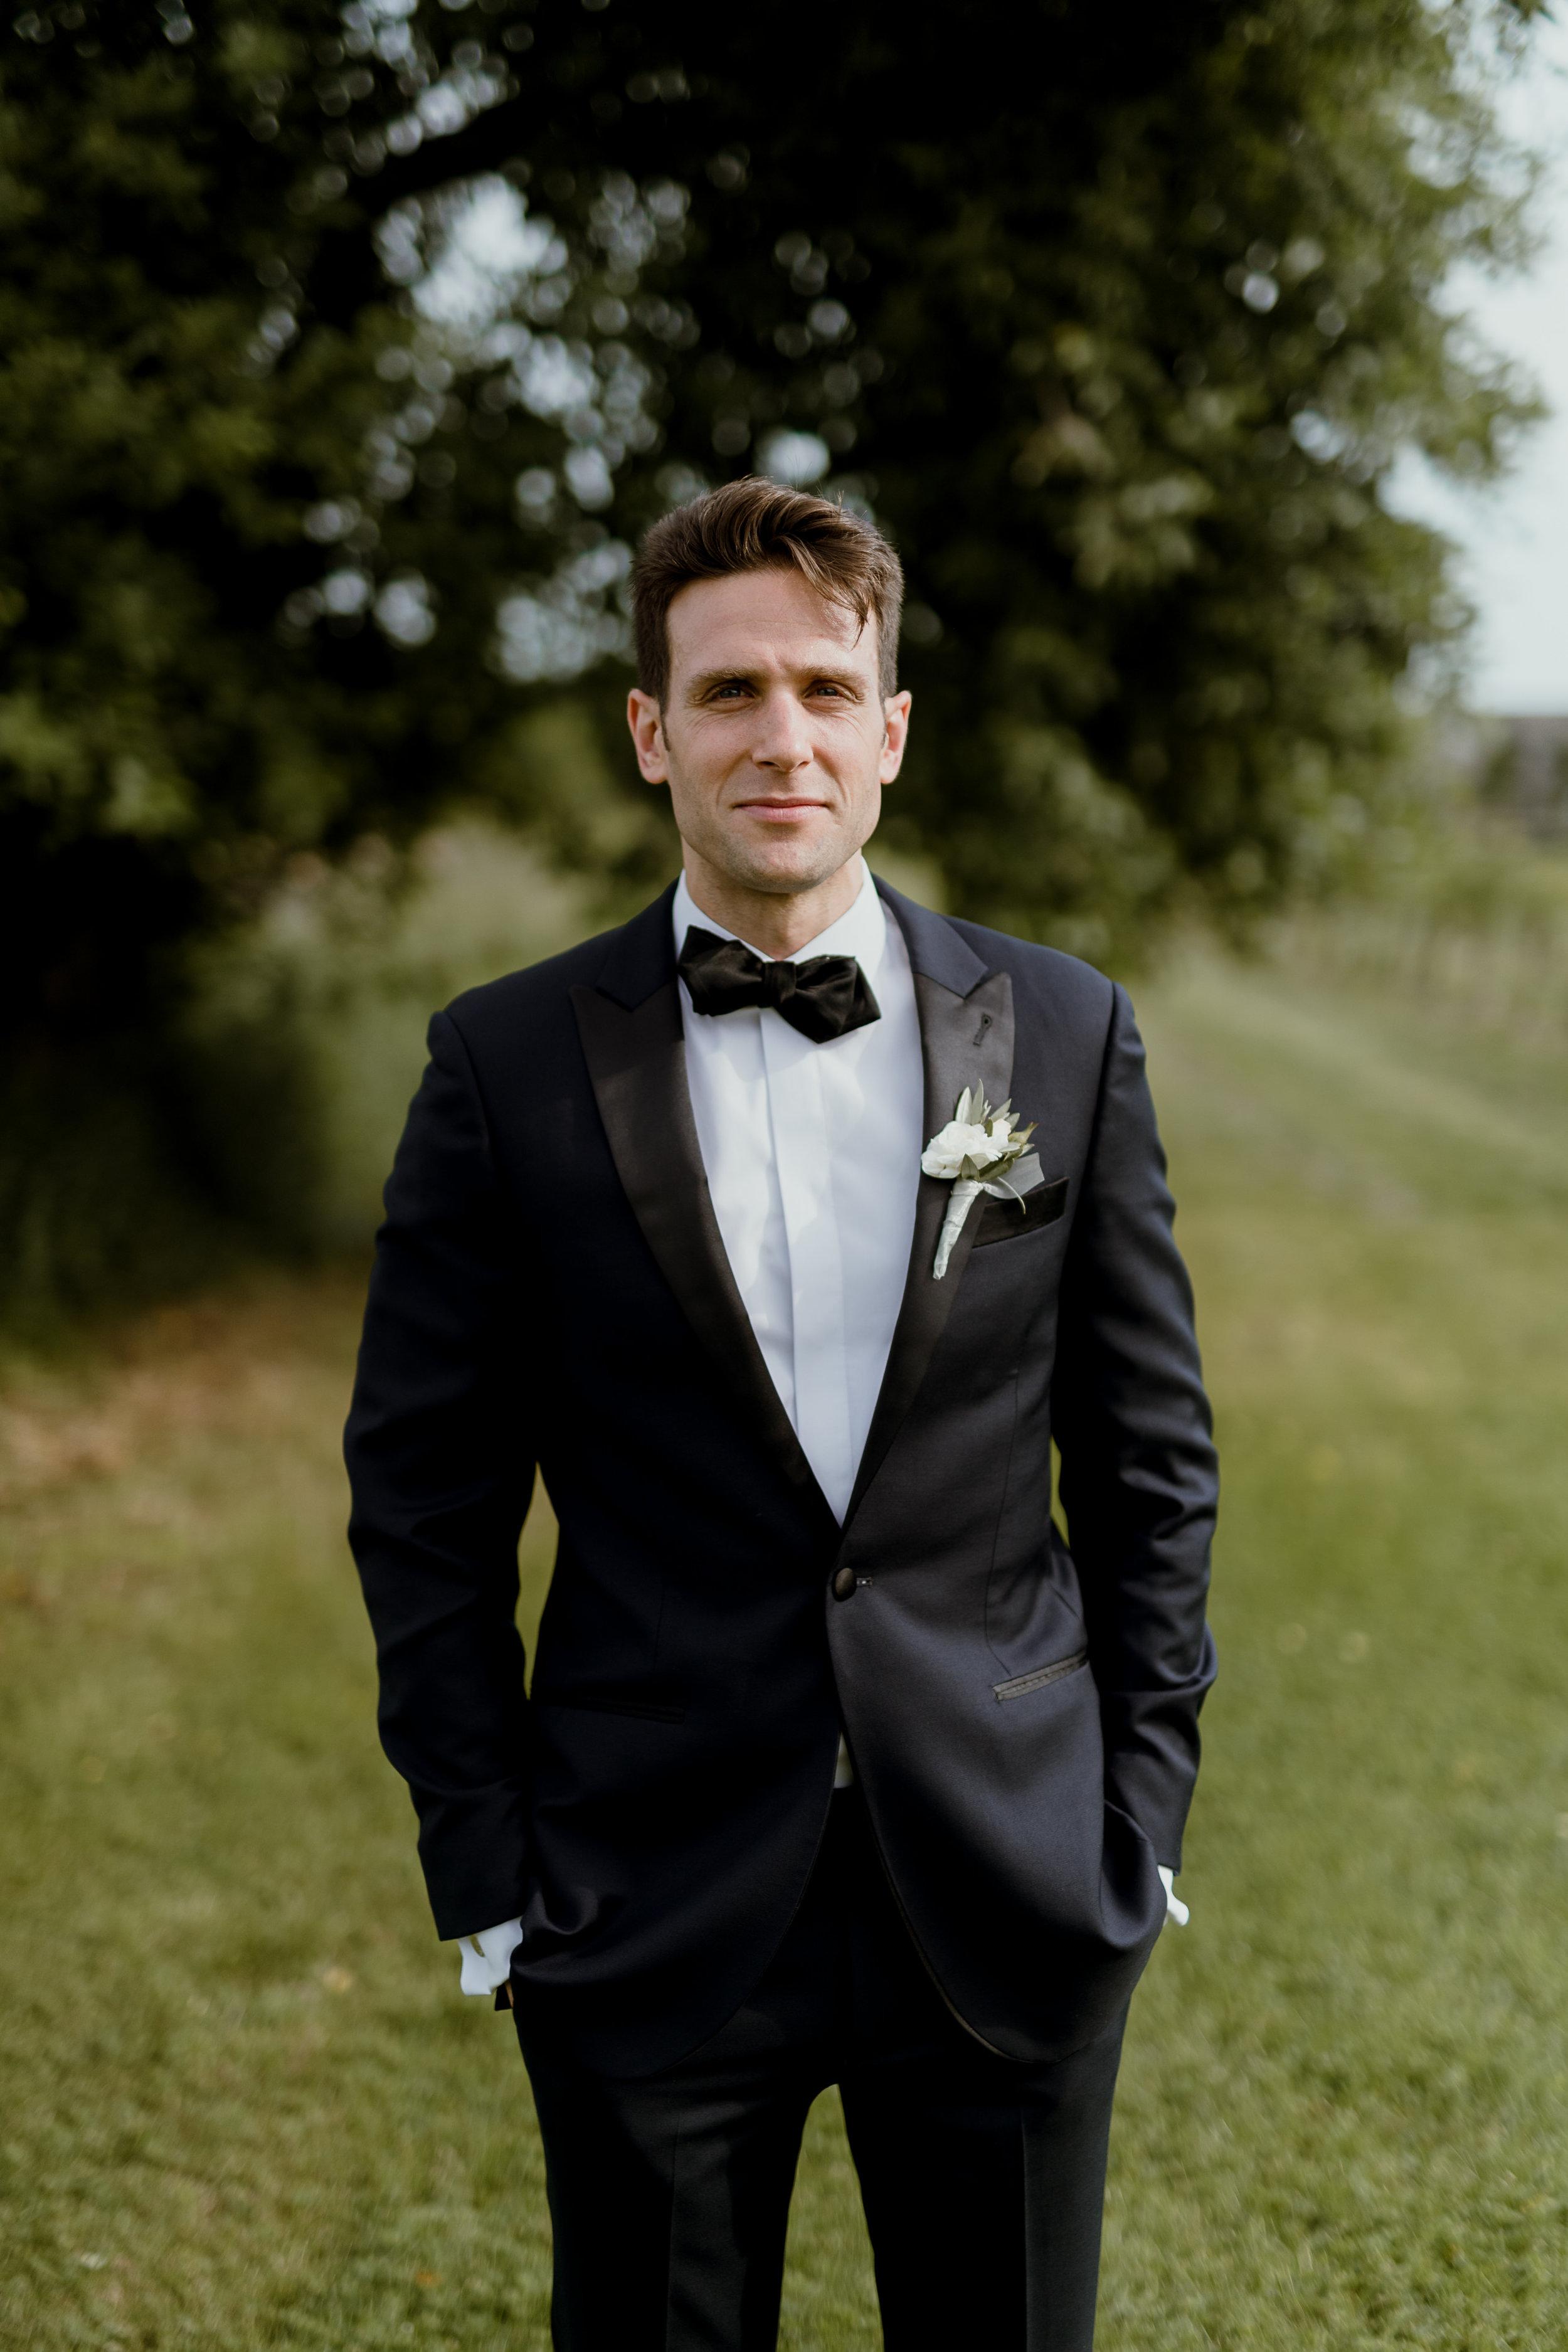 Green & White Wedding Jonathon Edwards Vineyard Wedding0-479.jpg